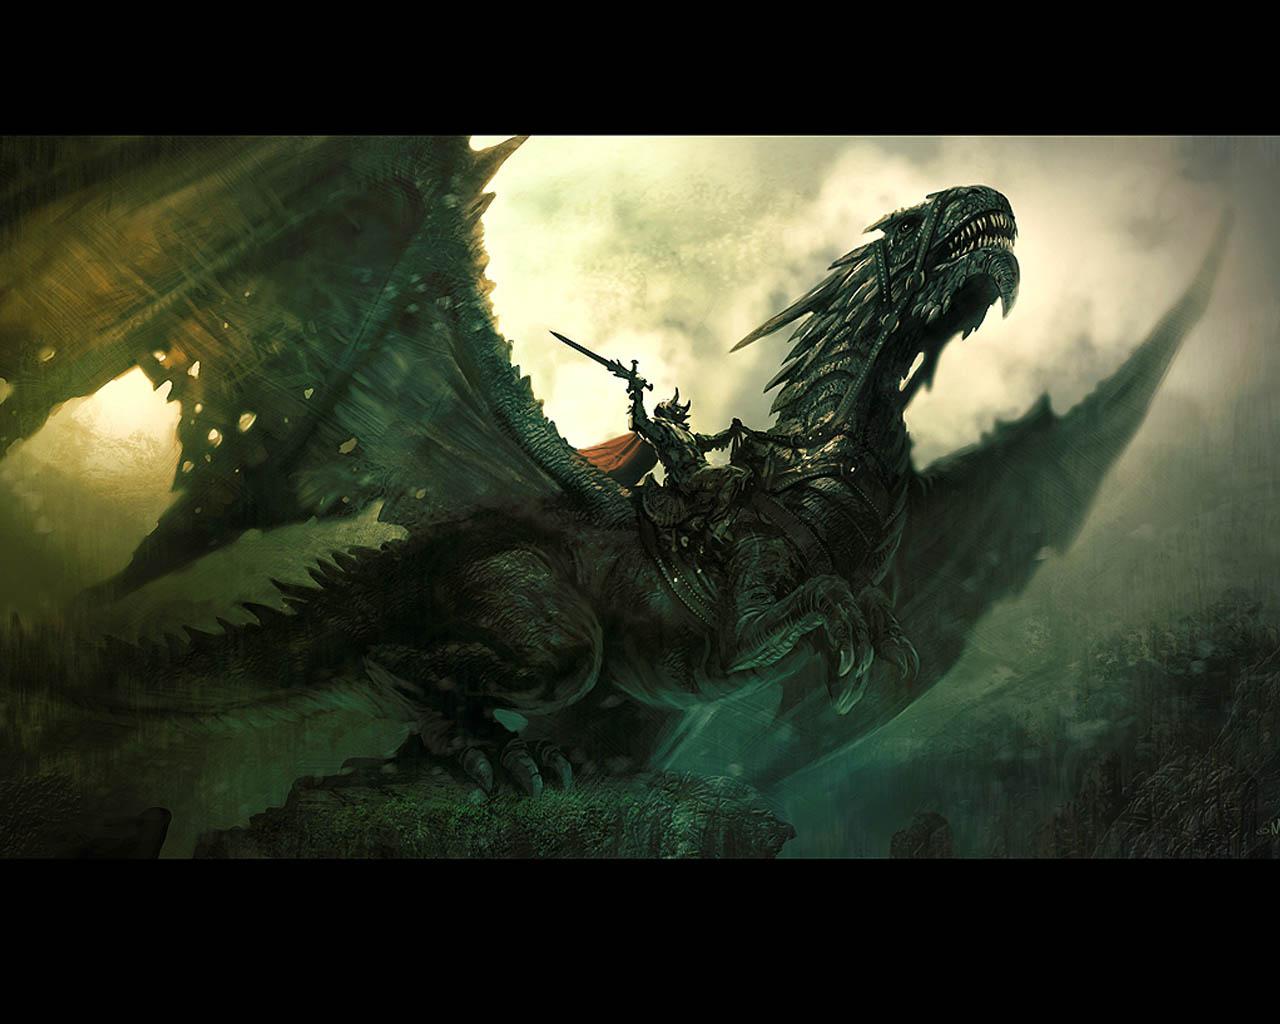 HQ Fantasy Dragon Wallpaper   HQ Wallpapers 1280x1024